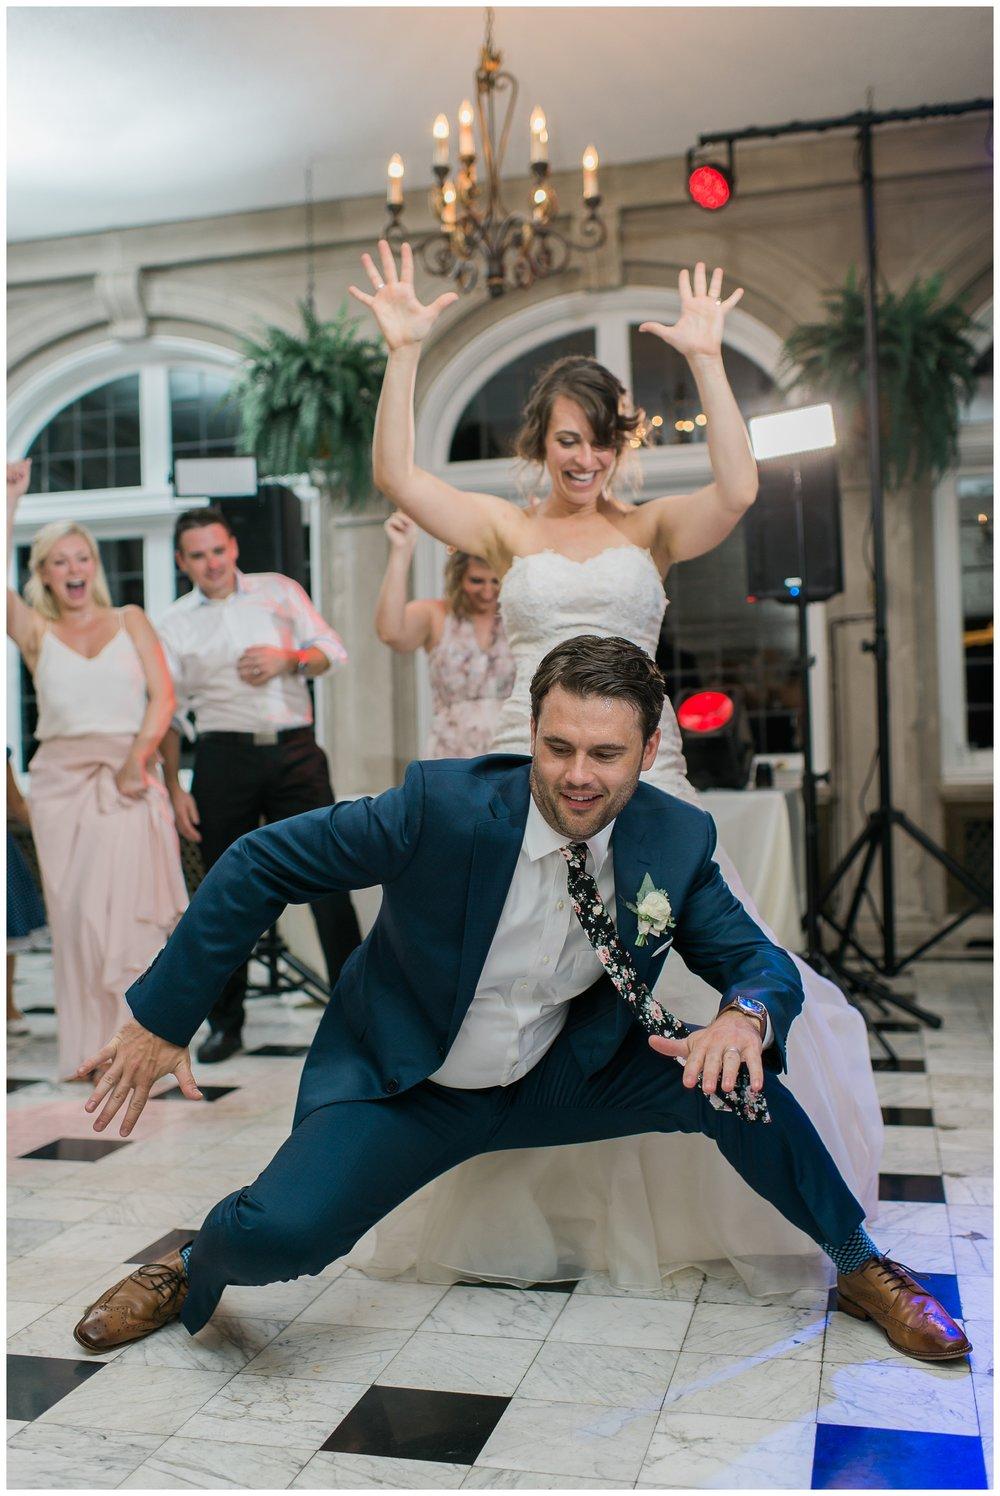 Rebecca_Bridges_Photography_Indianapolis_Wedding_Photographer_5285.jpg